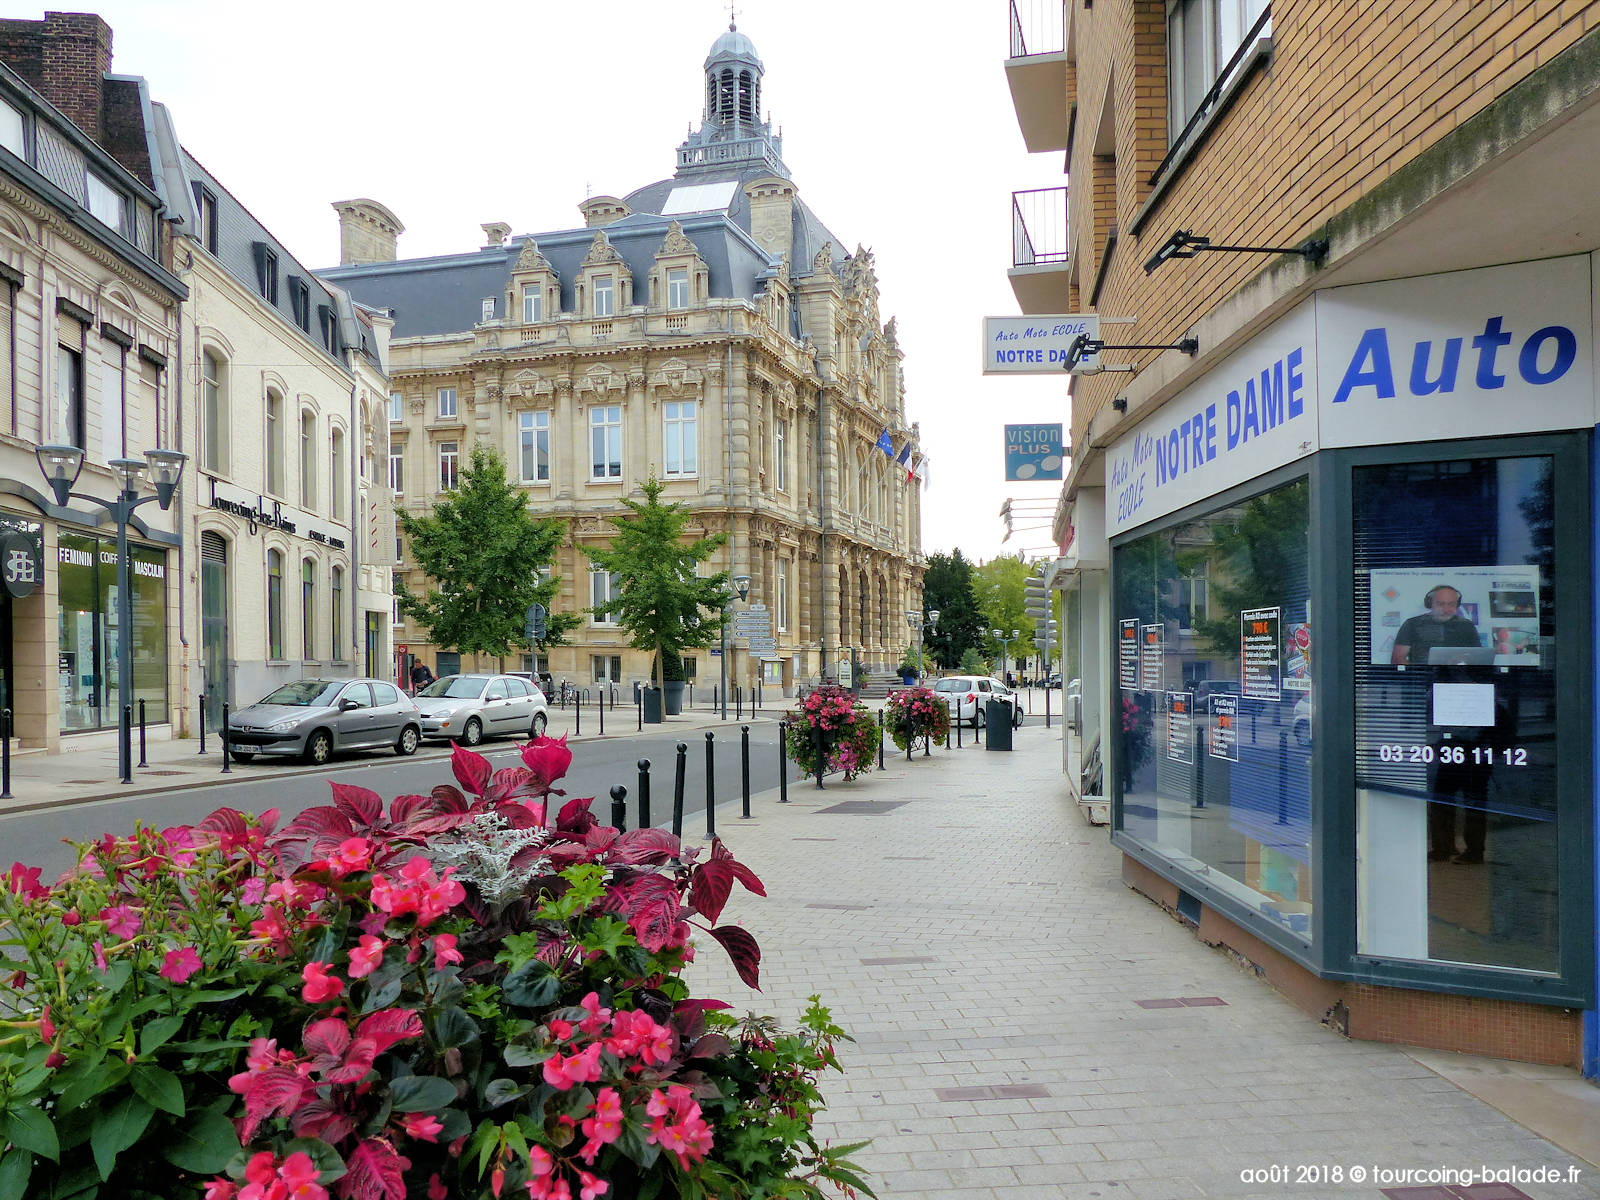 Moto École Notre Dame, Tourcoing 2018